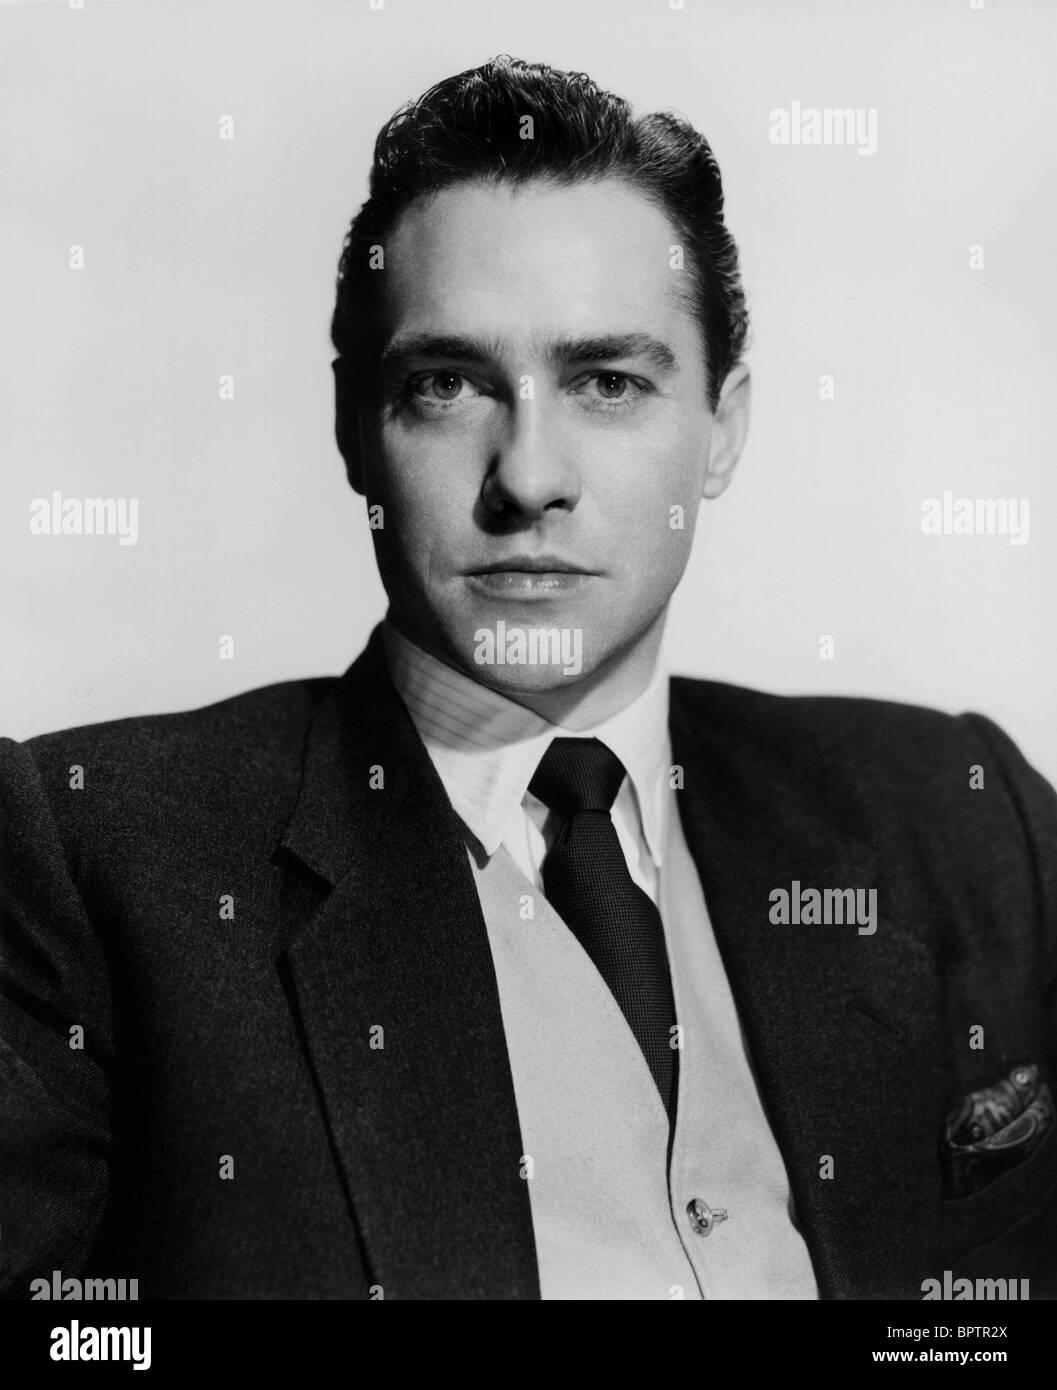 RICHARD TODD ACTOR (1956) - Stock Image